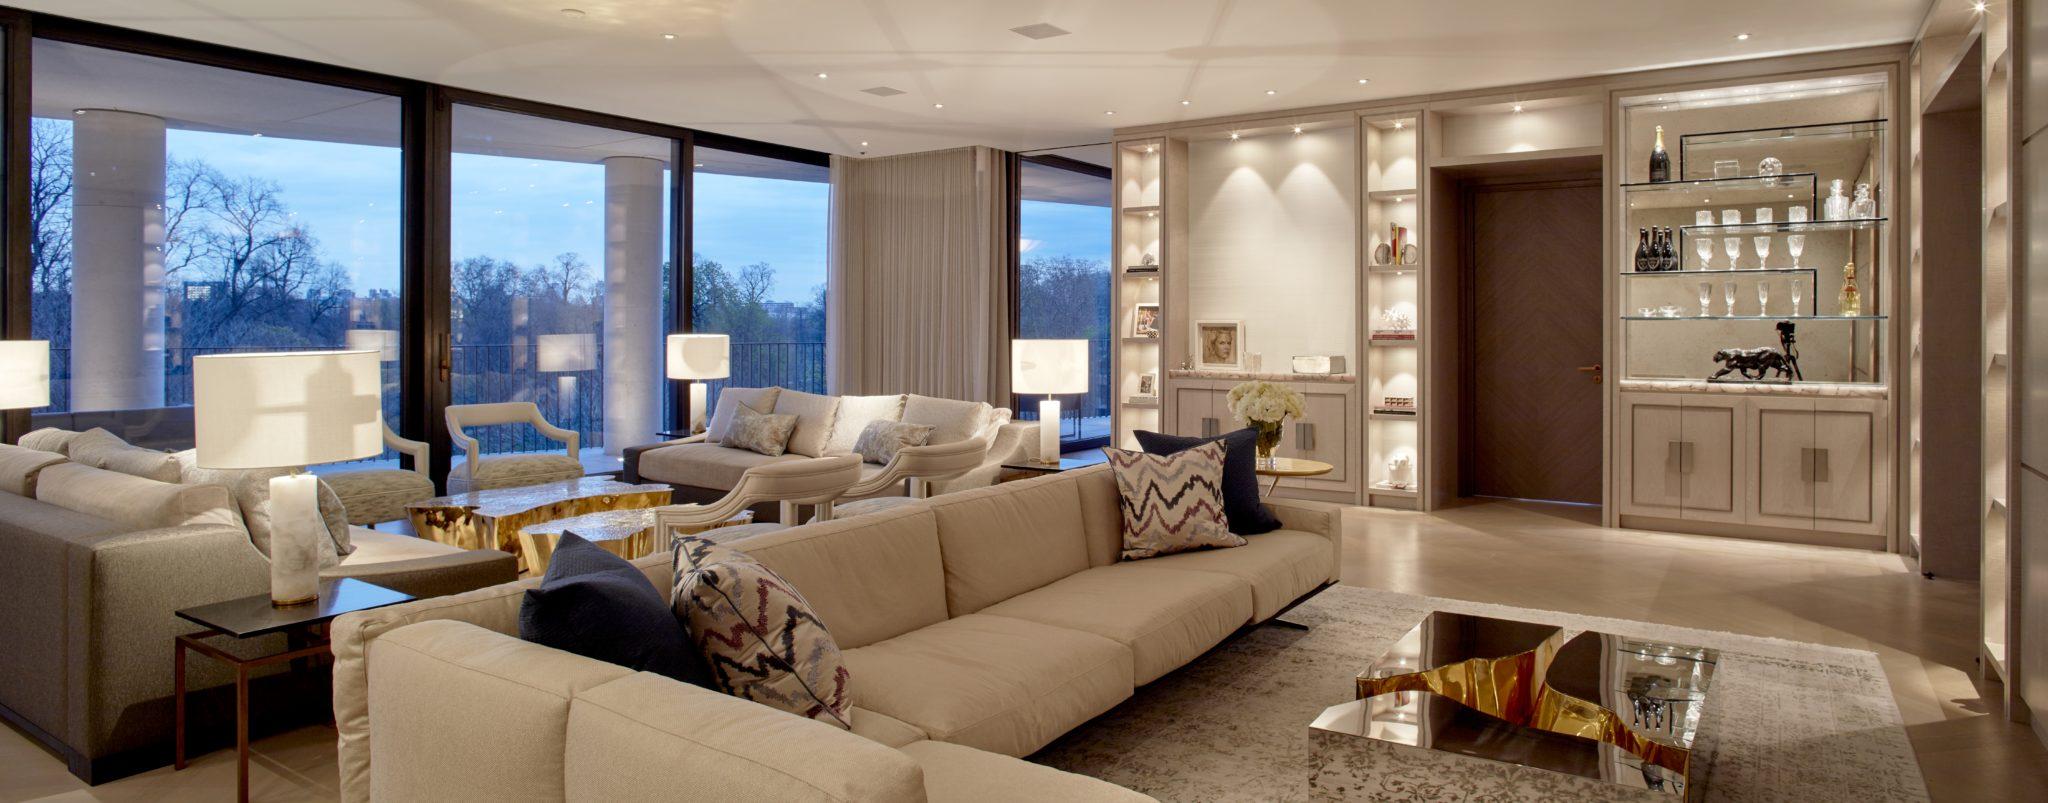 Kensington -luxury apartment by Rigby & Rigby